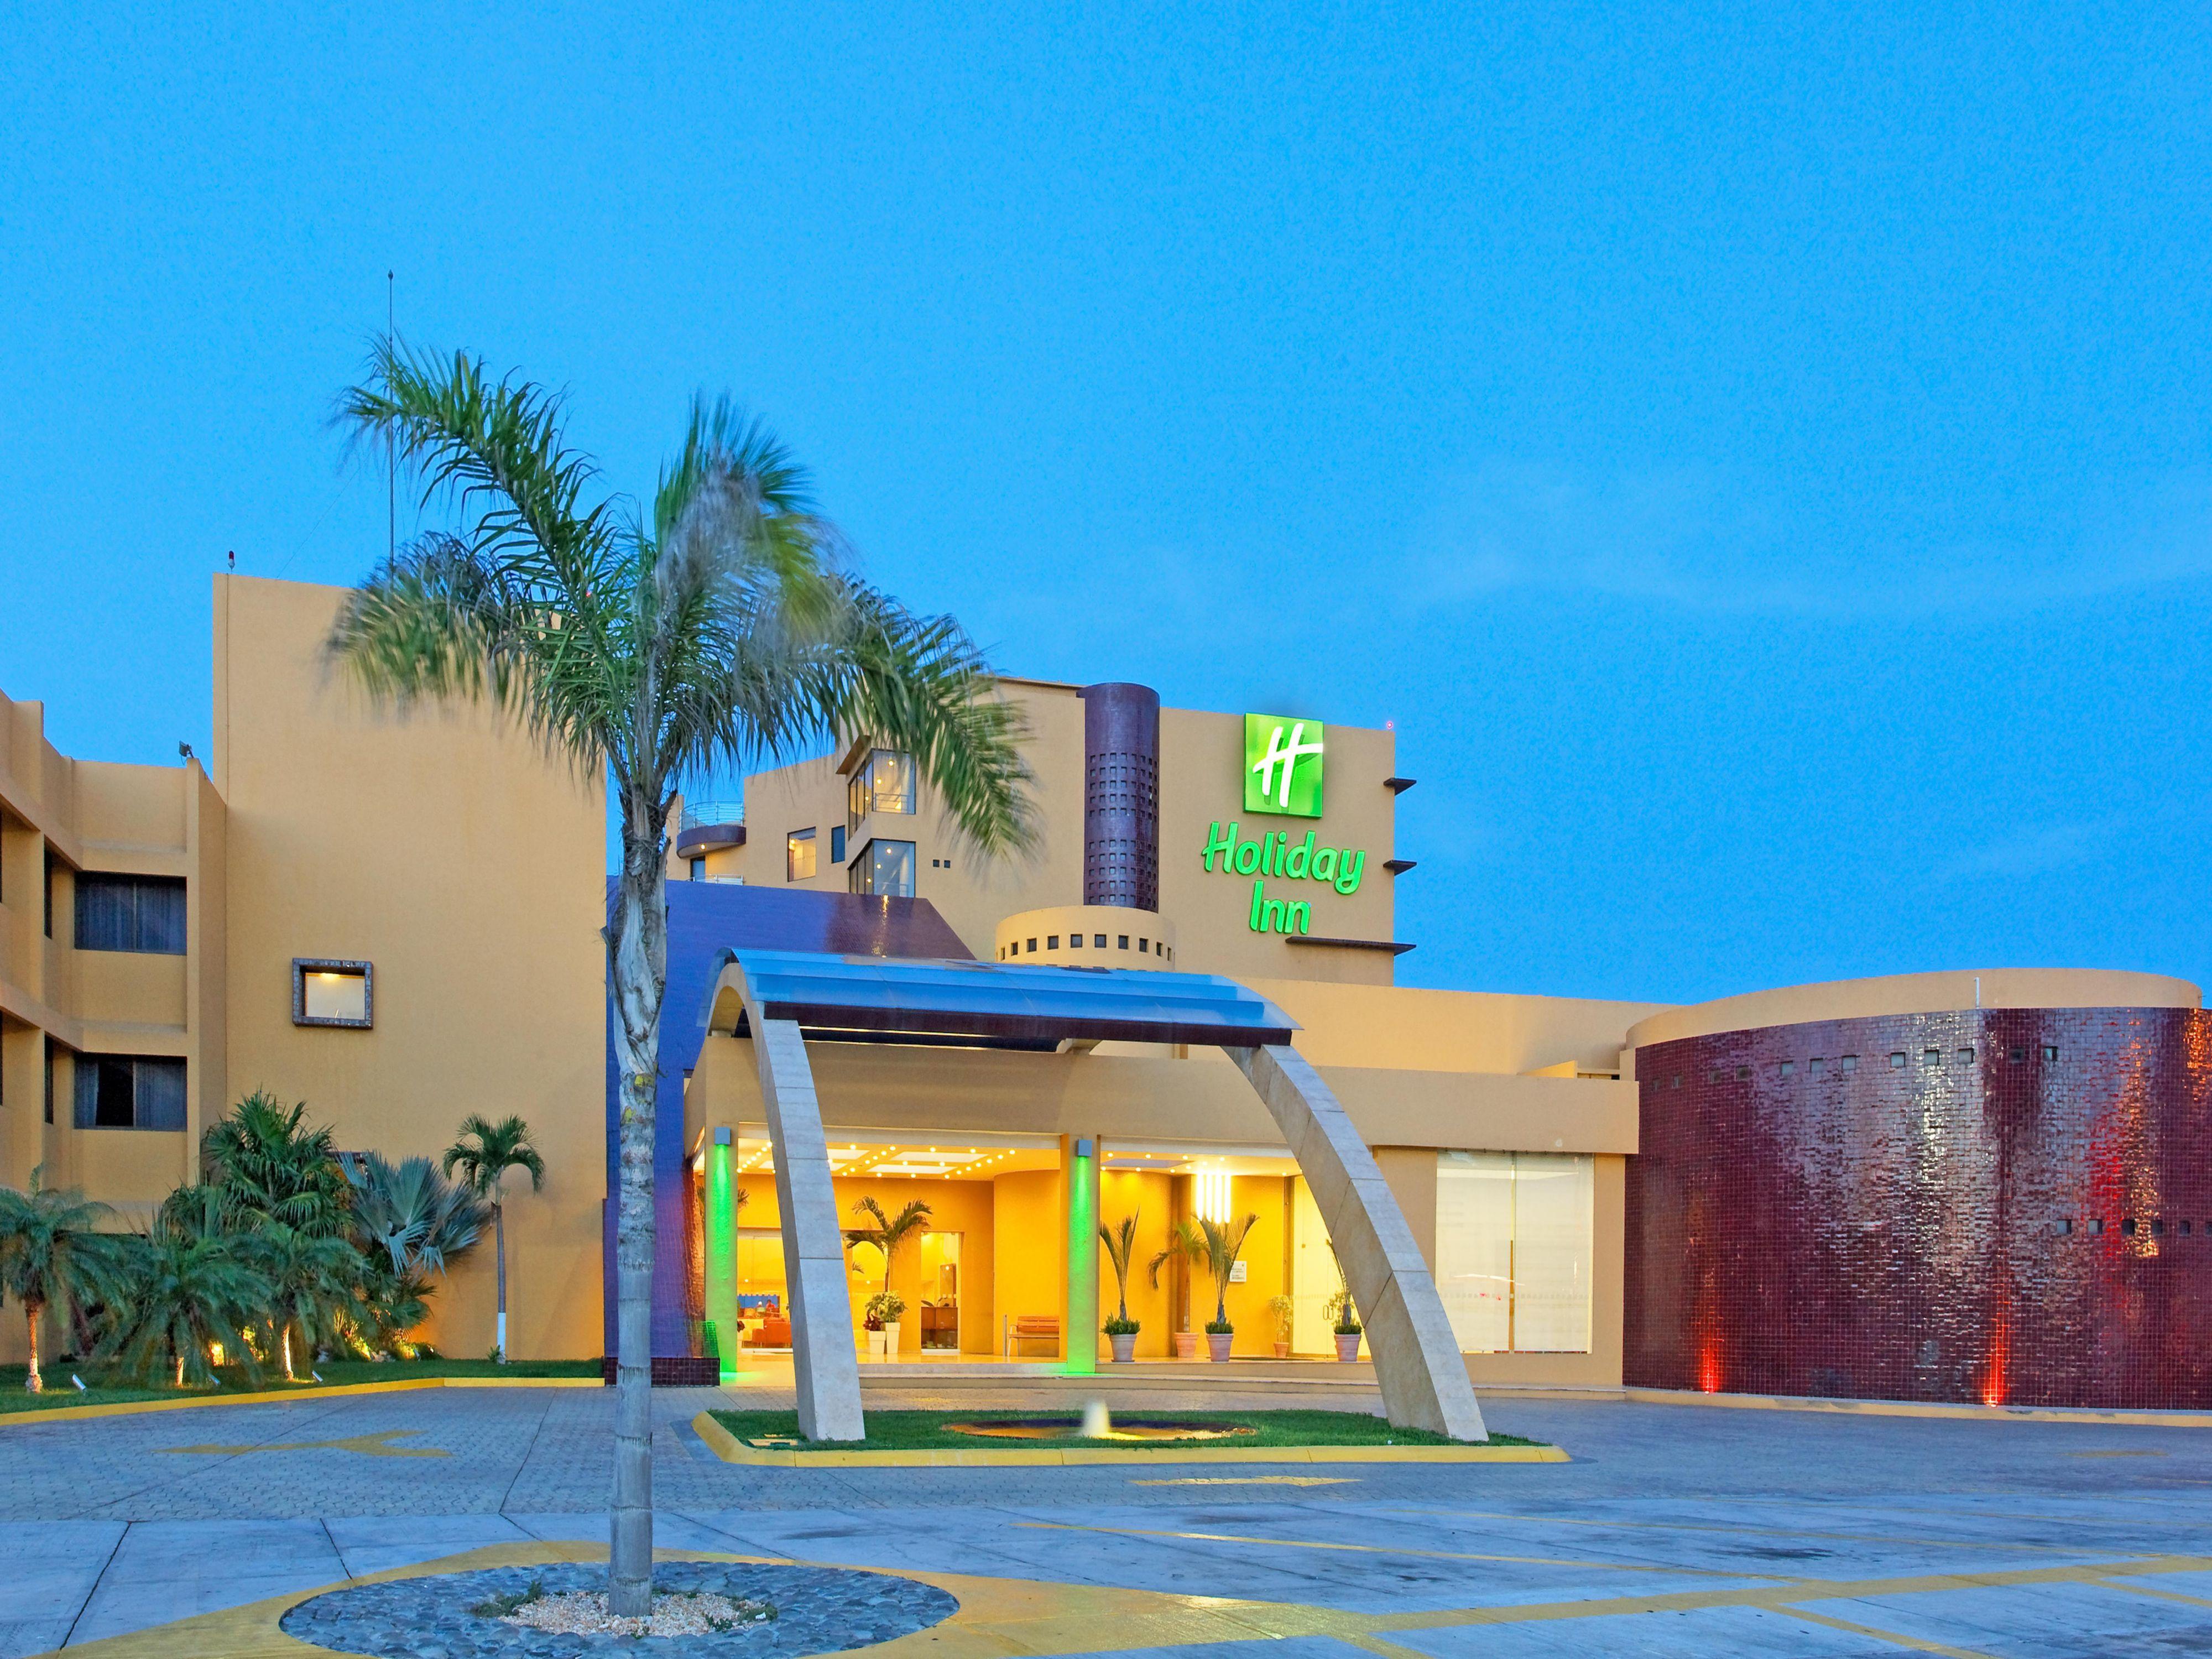 Things To Do In Boca Del Rio Near Holiday Inn Veracruz Boca